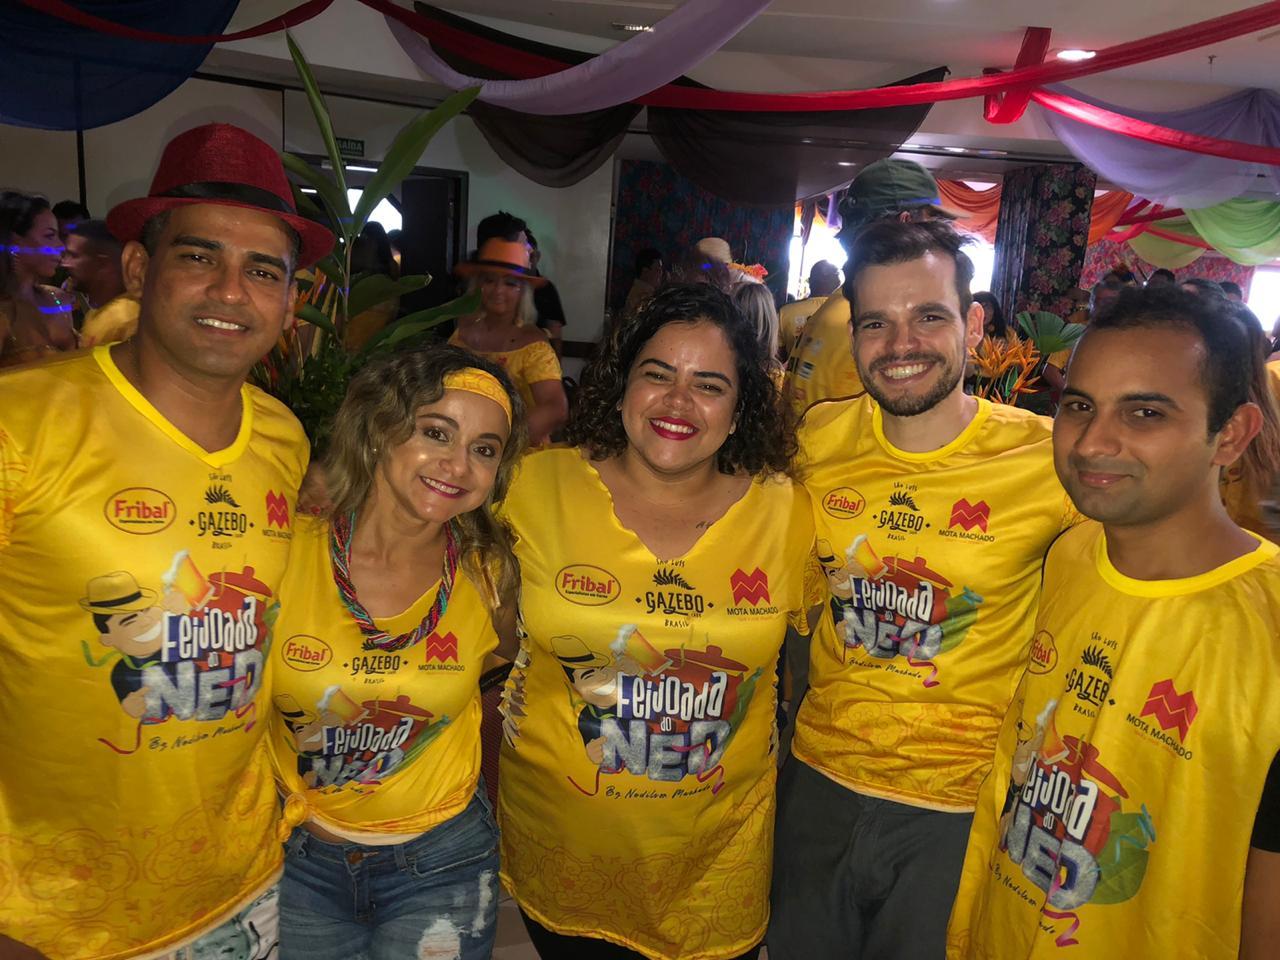 Equipe Potiguar: Elenilson Santos, Nilde Moraes, Thaylana Sousa, Rafael Maciel, Marcelo Silva.